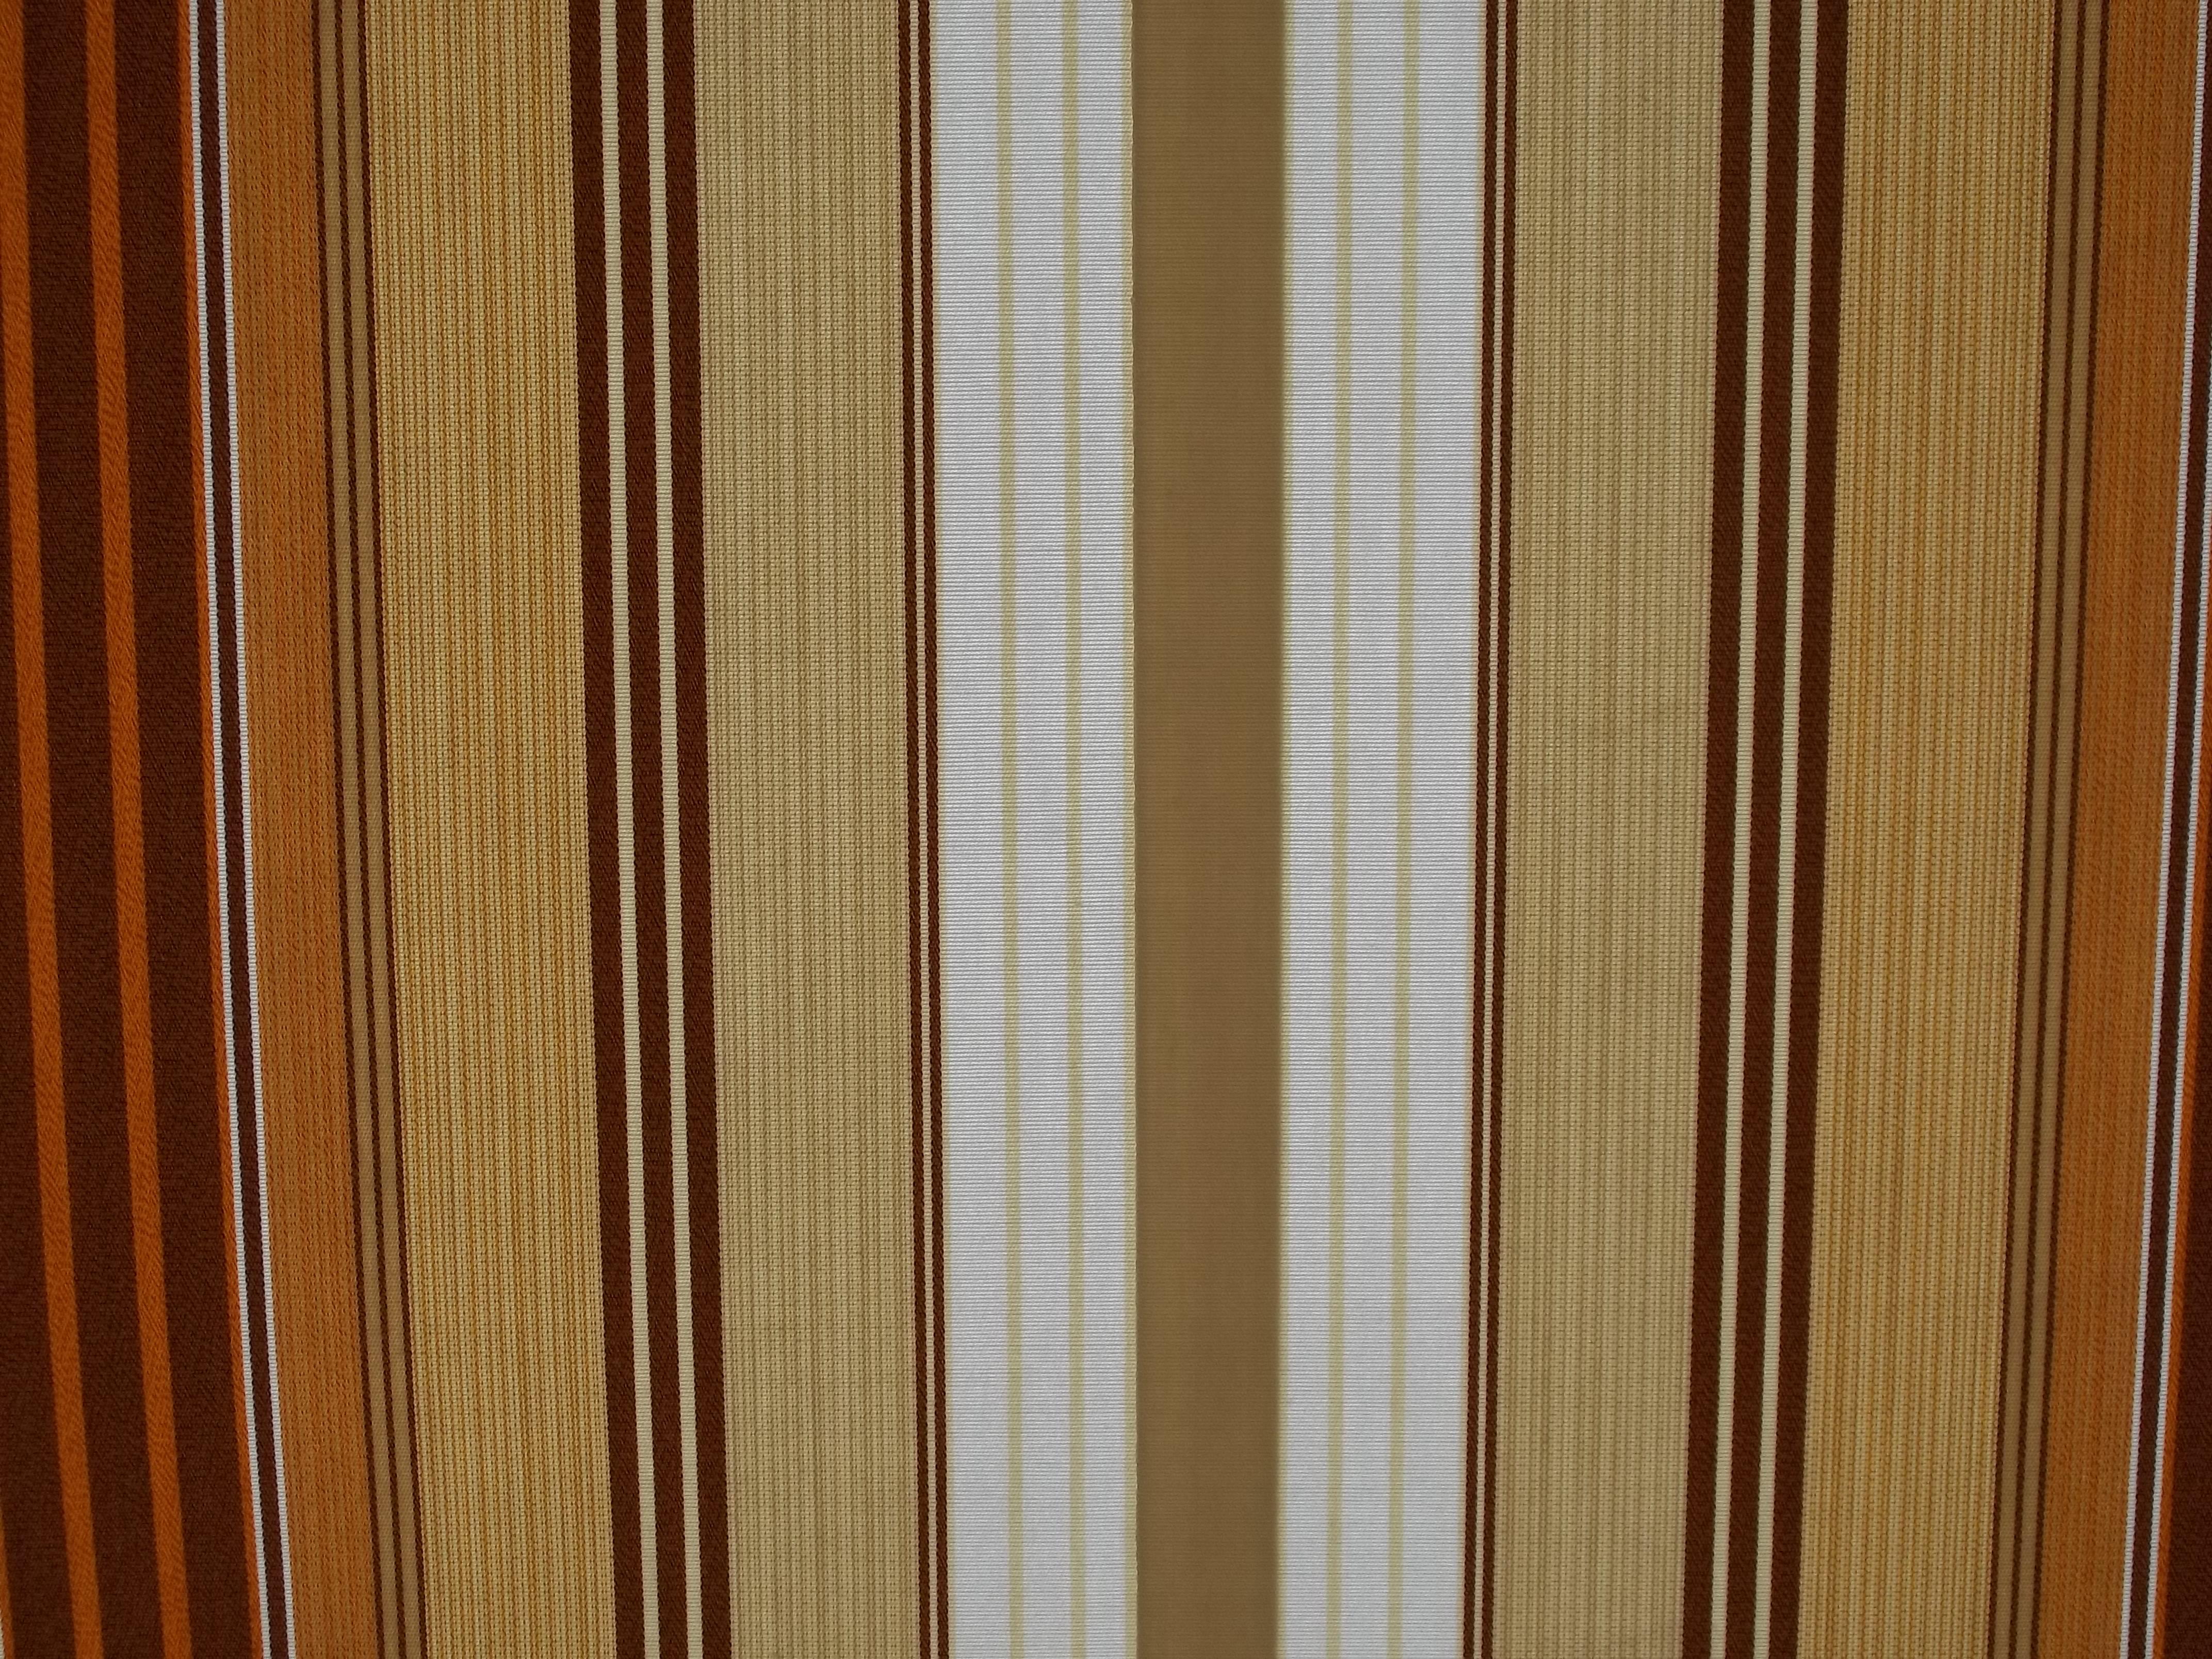 Ingrosso tende torino sanotint light tabella colori for Tessuti arredamento outlet torino